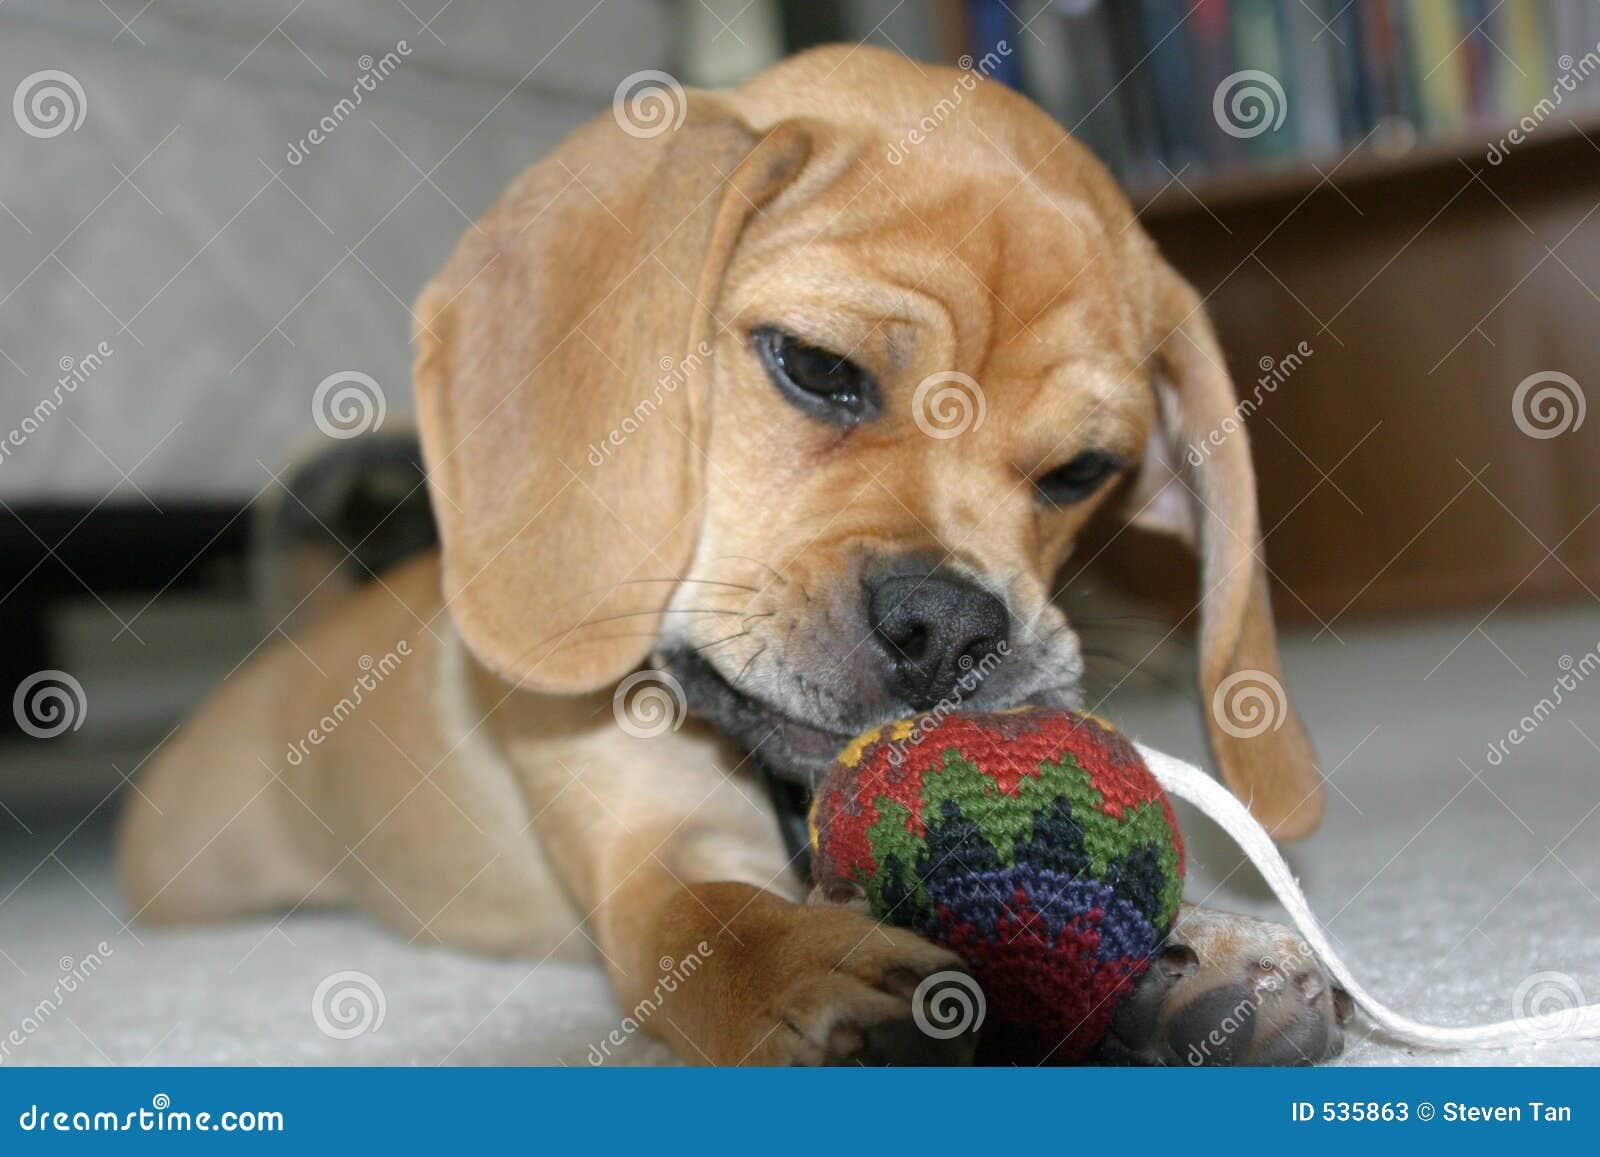 Download 逗人喜爱的小狗 库存图片. 图片 包括有 哈巴狗, 宠物, 小狗, 额嘴, 使用, 逗人喜爱 - 535863